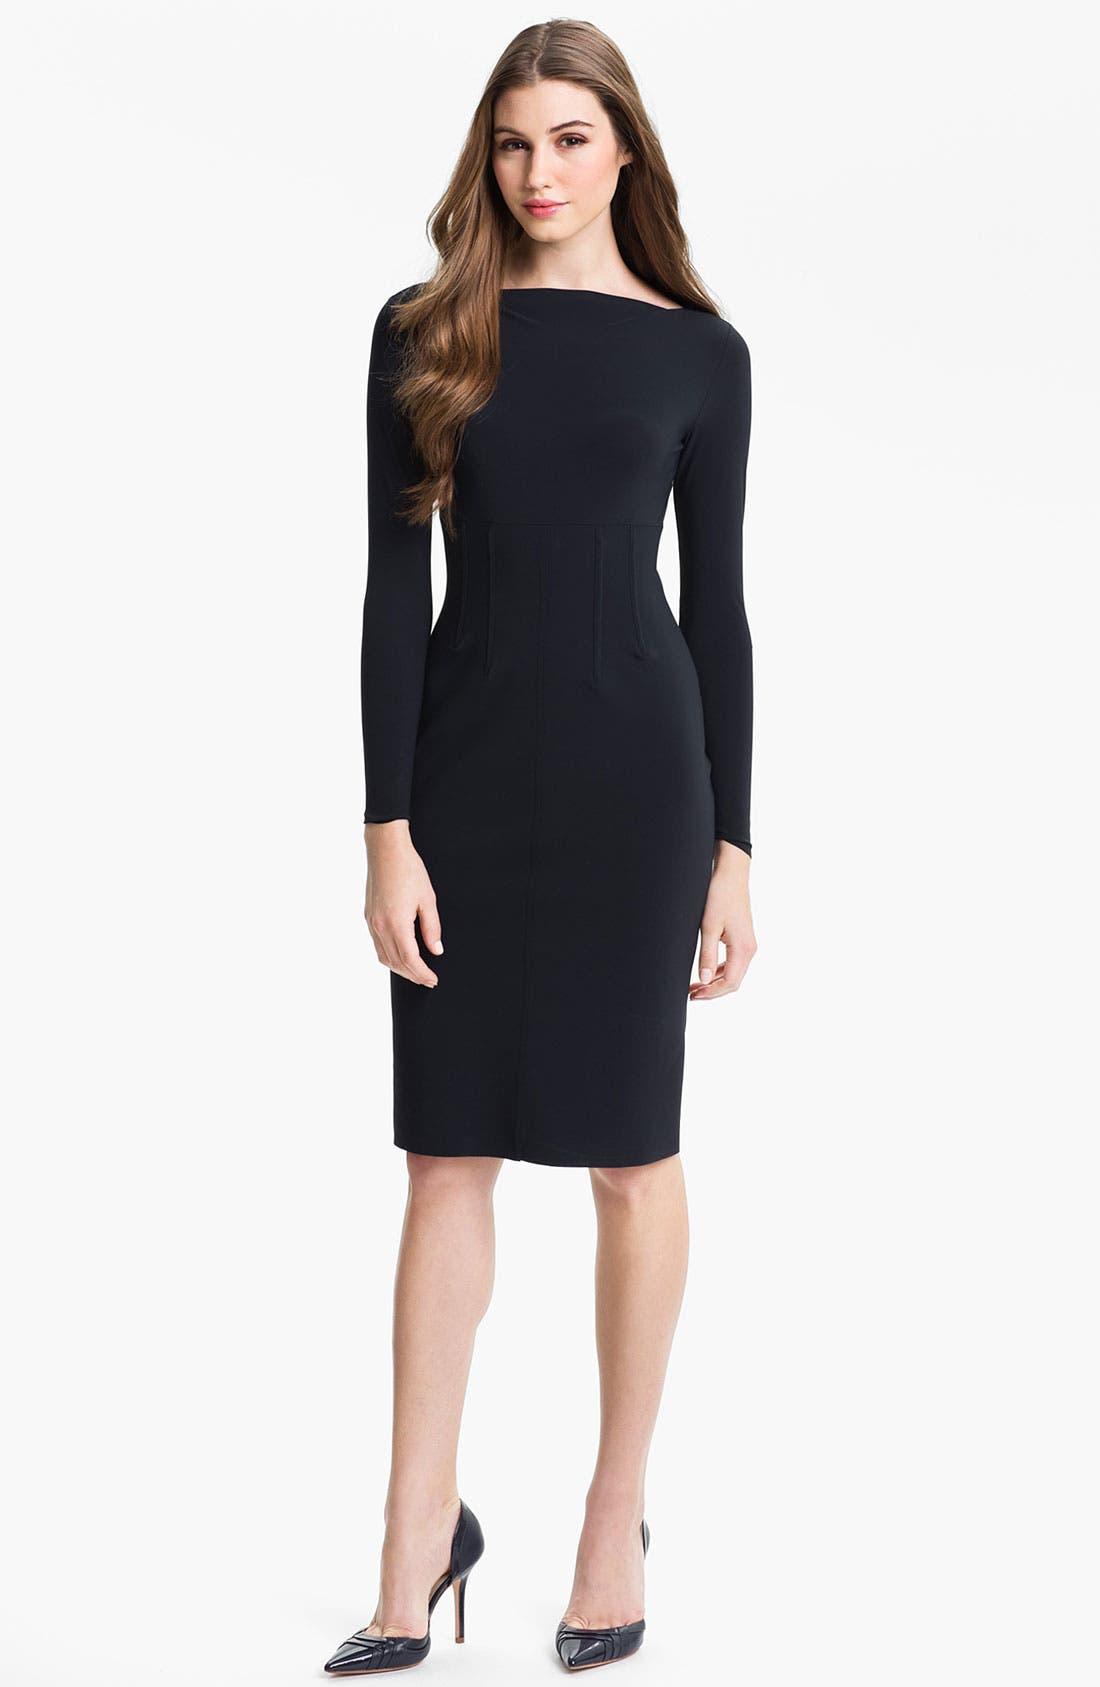 Alternate Image 1 Selected - La Petite Robe by Chiara Boni Boatneck Dress